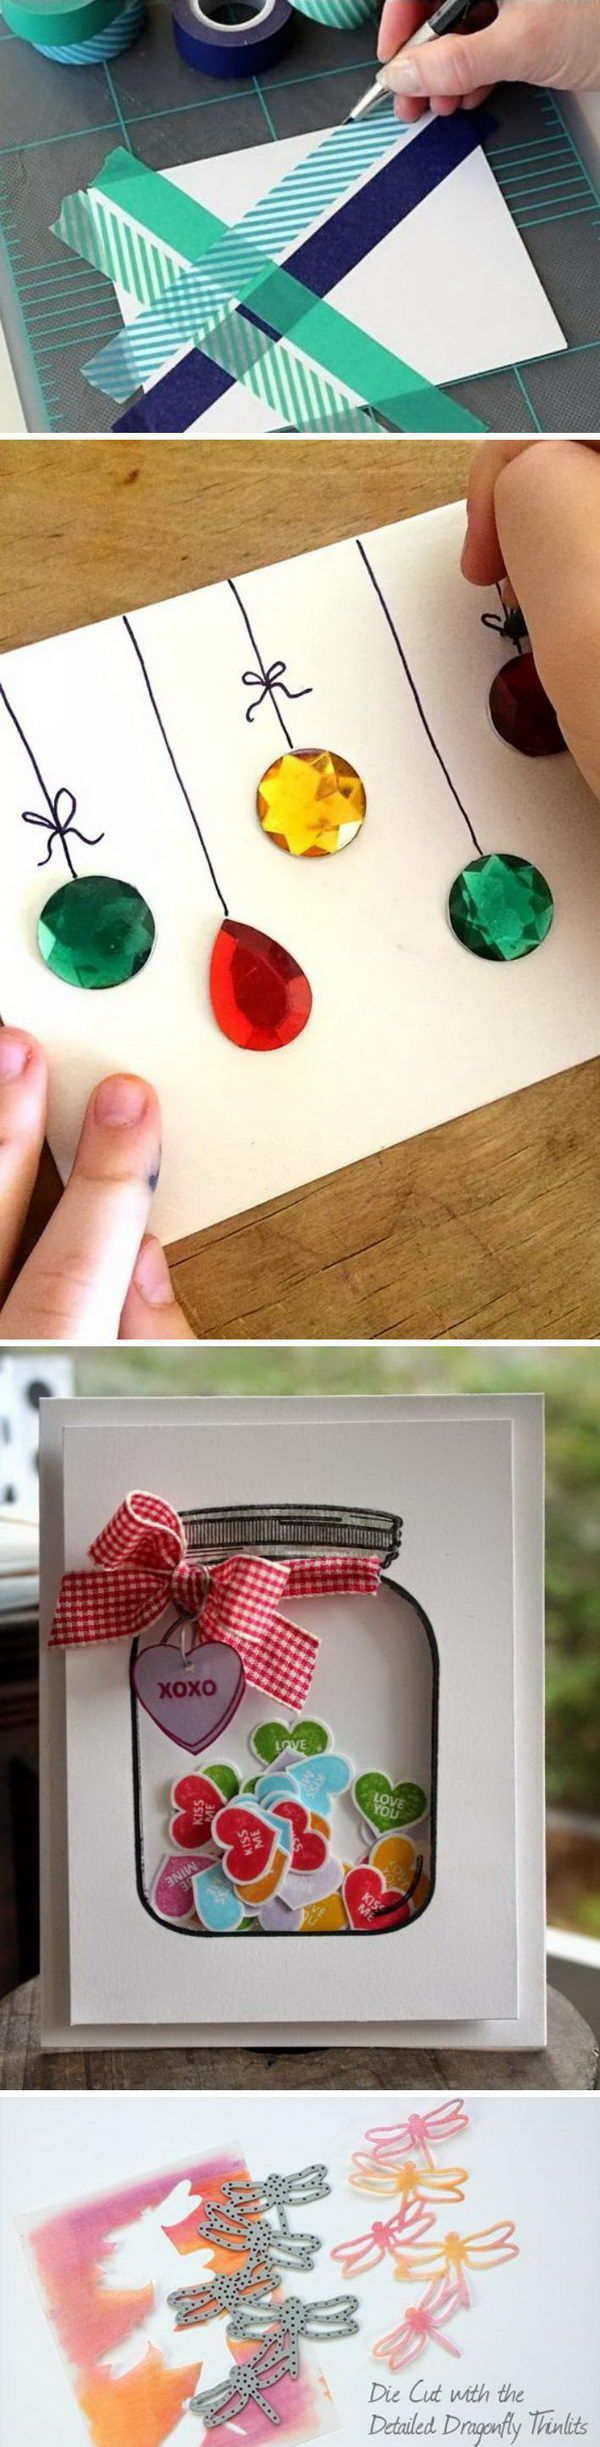 Handmade Card Ideas and Tutorials